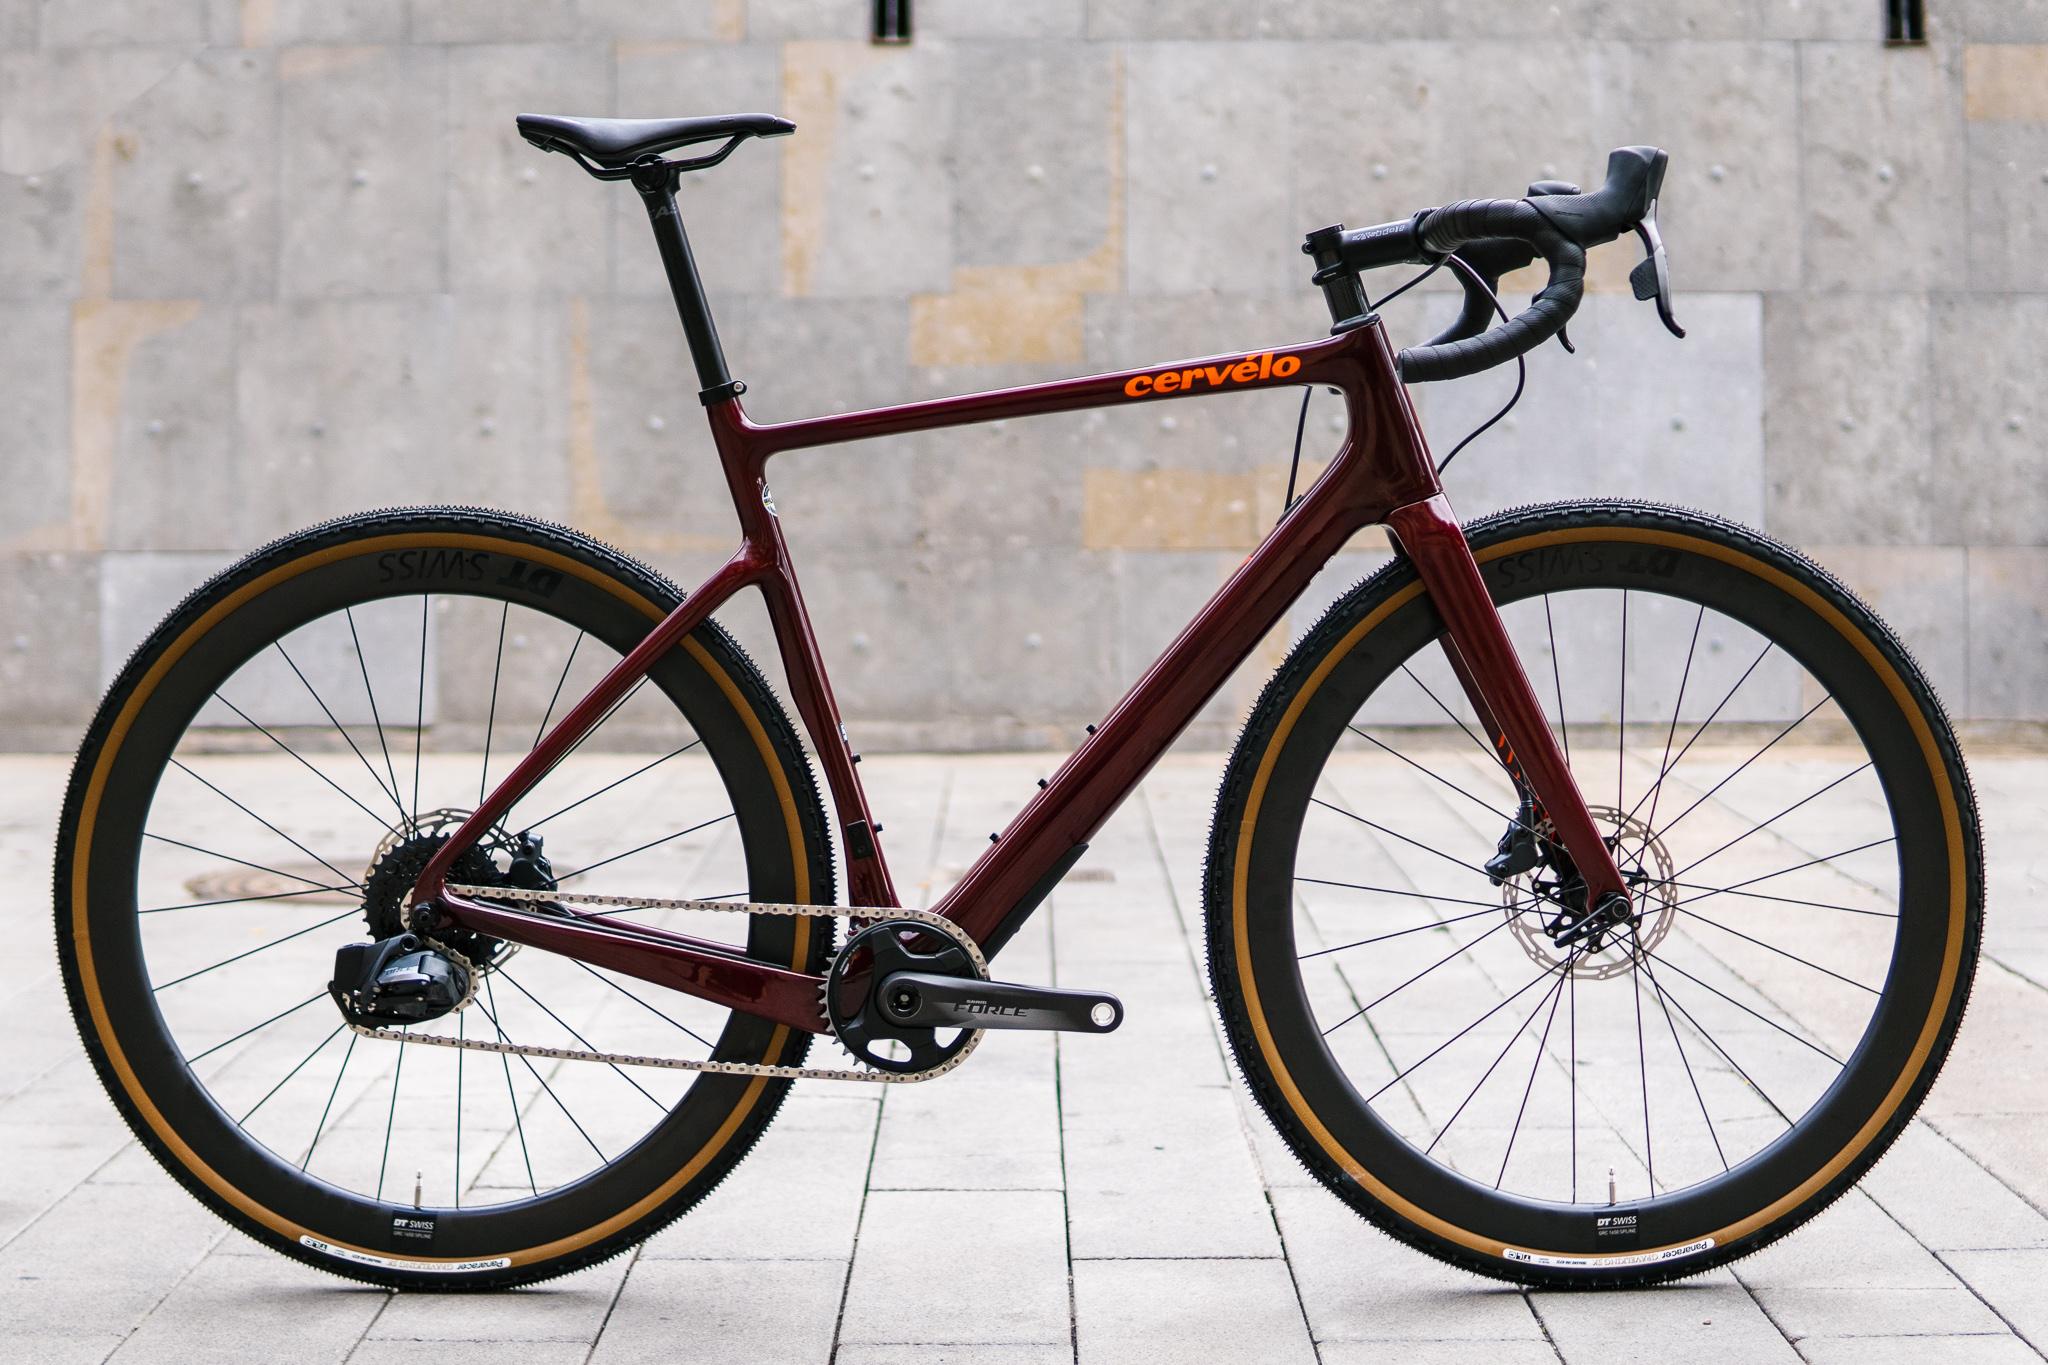 Rent your dream bike in Girona